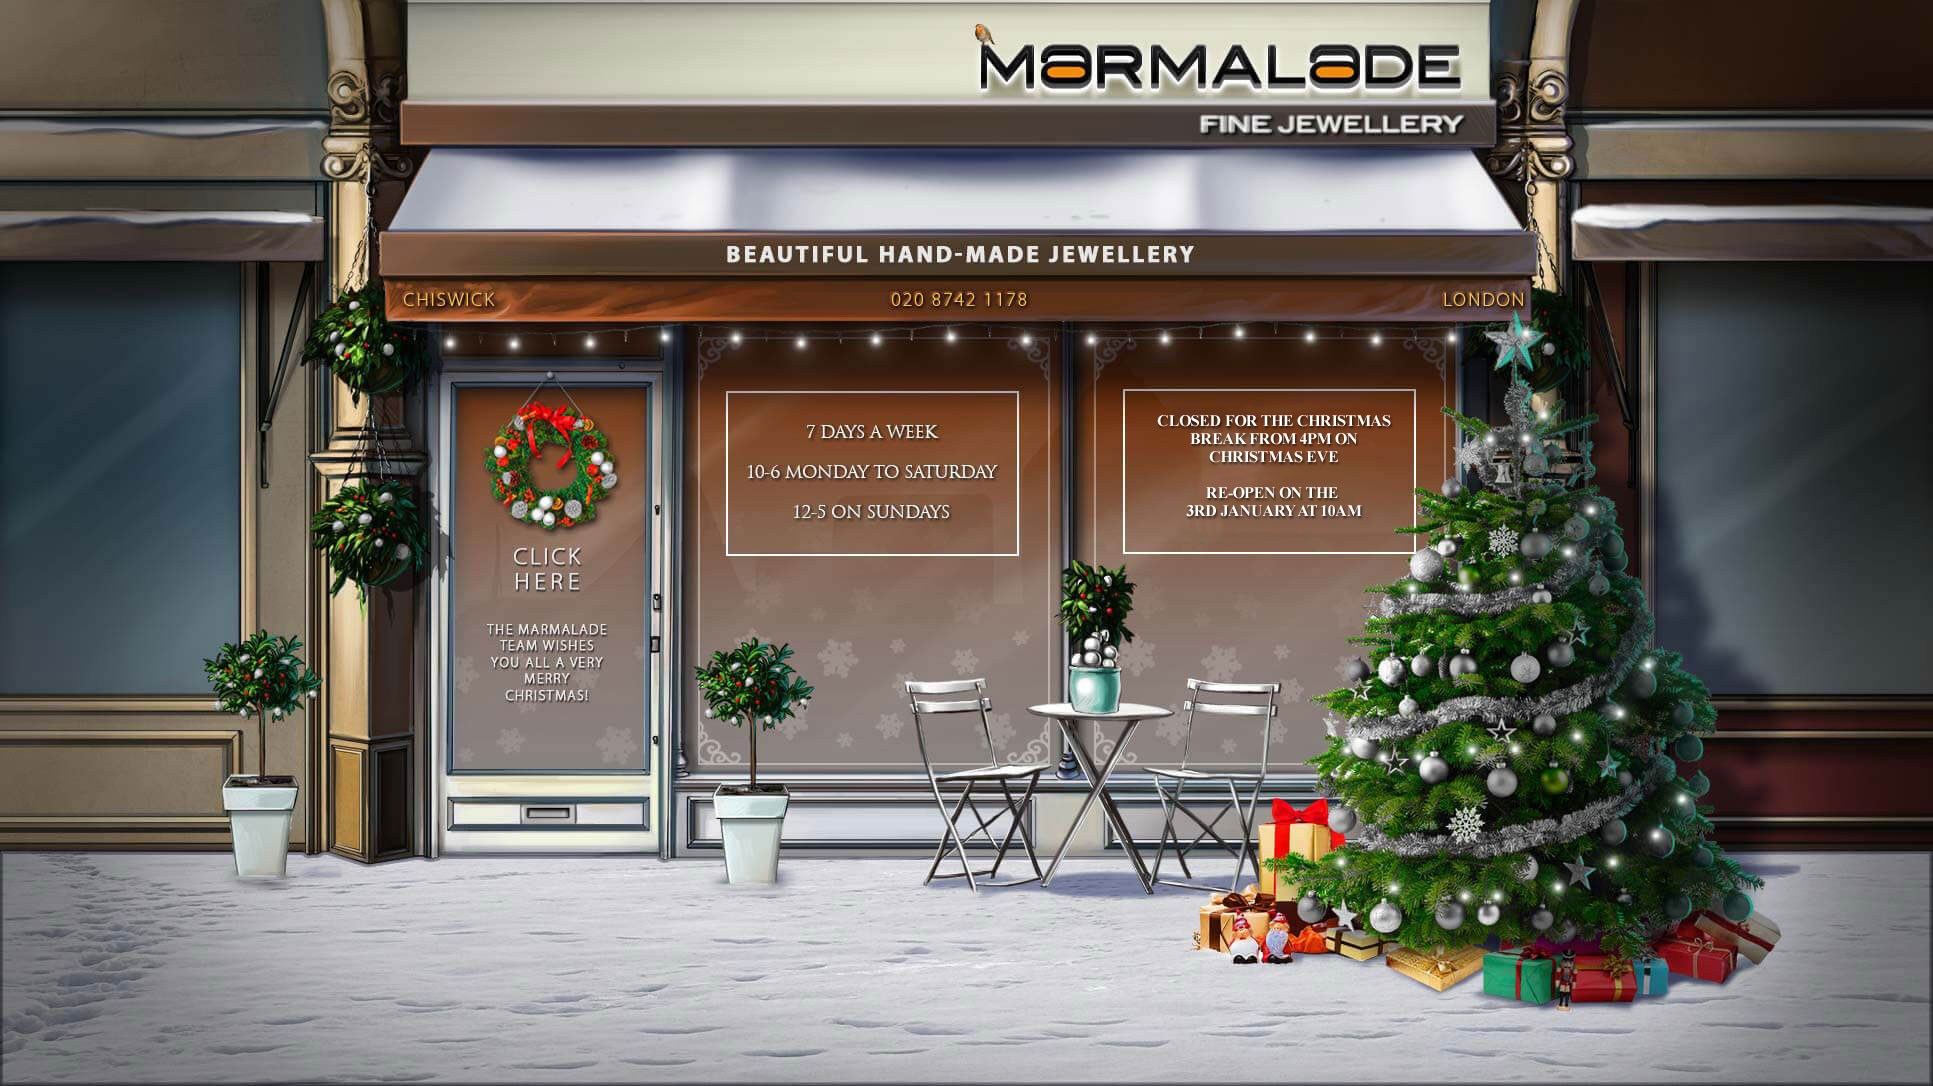 Marmalade Jewellery - Beautiful hand-made Jewellery